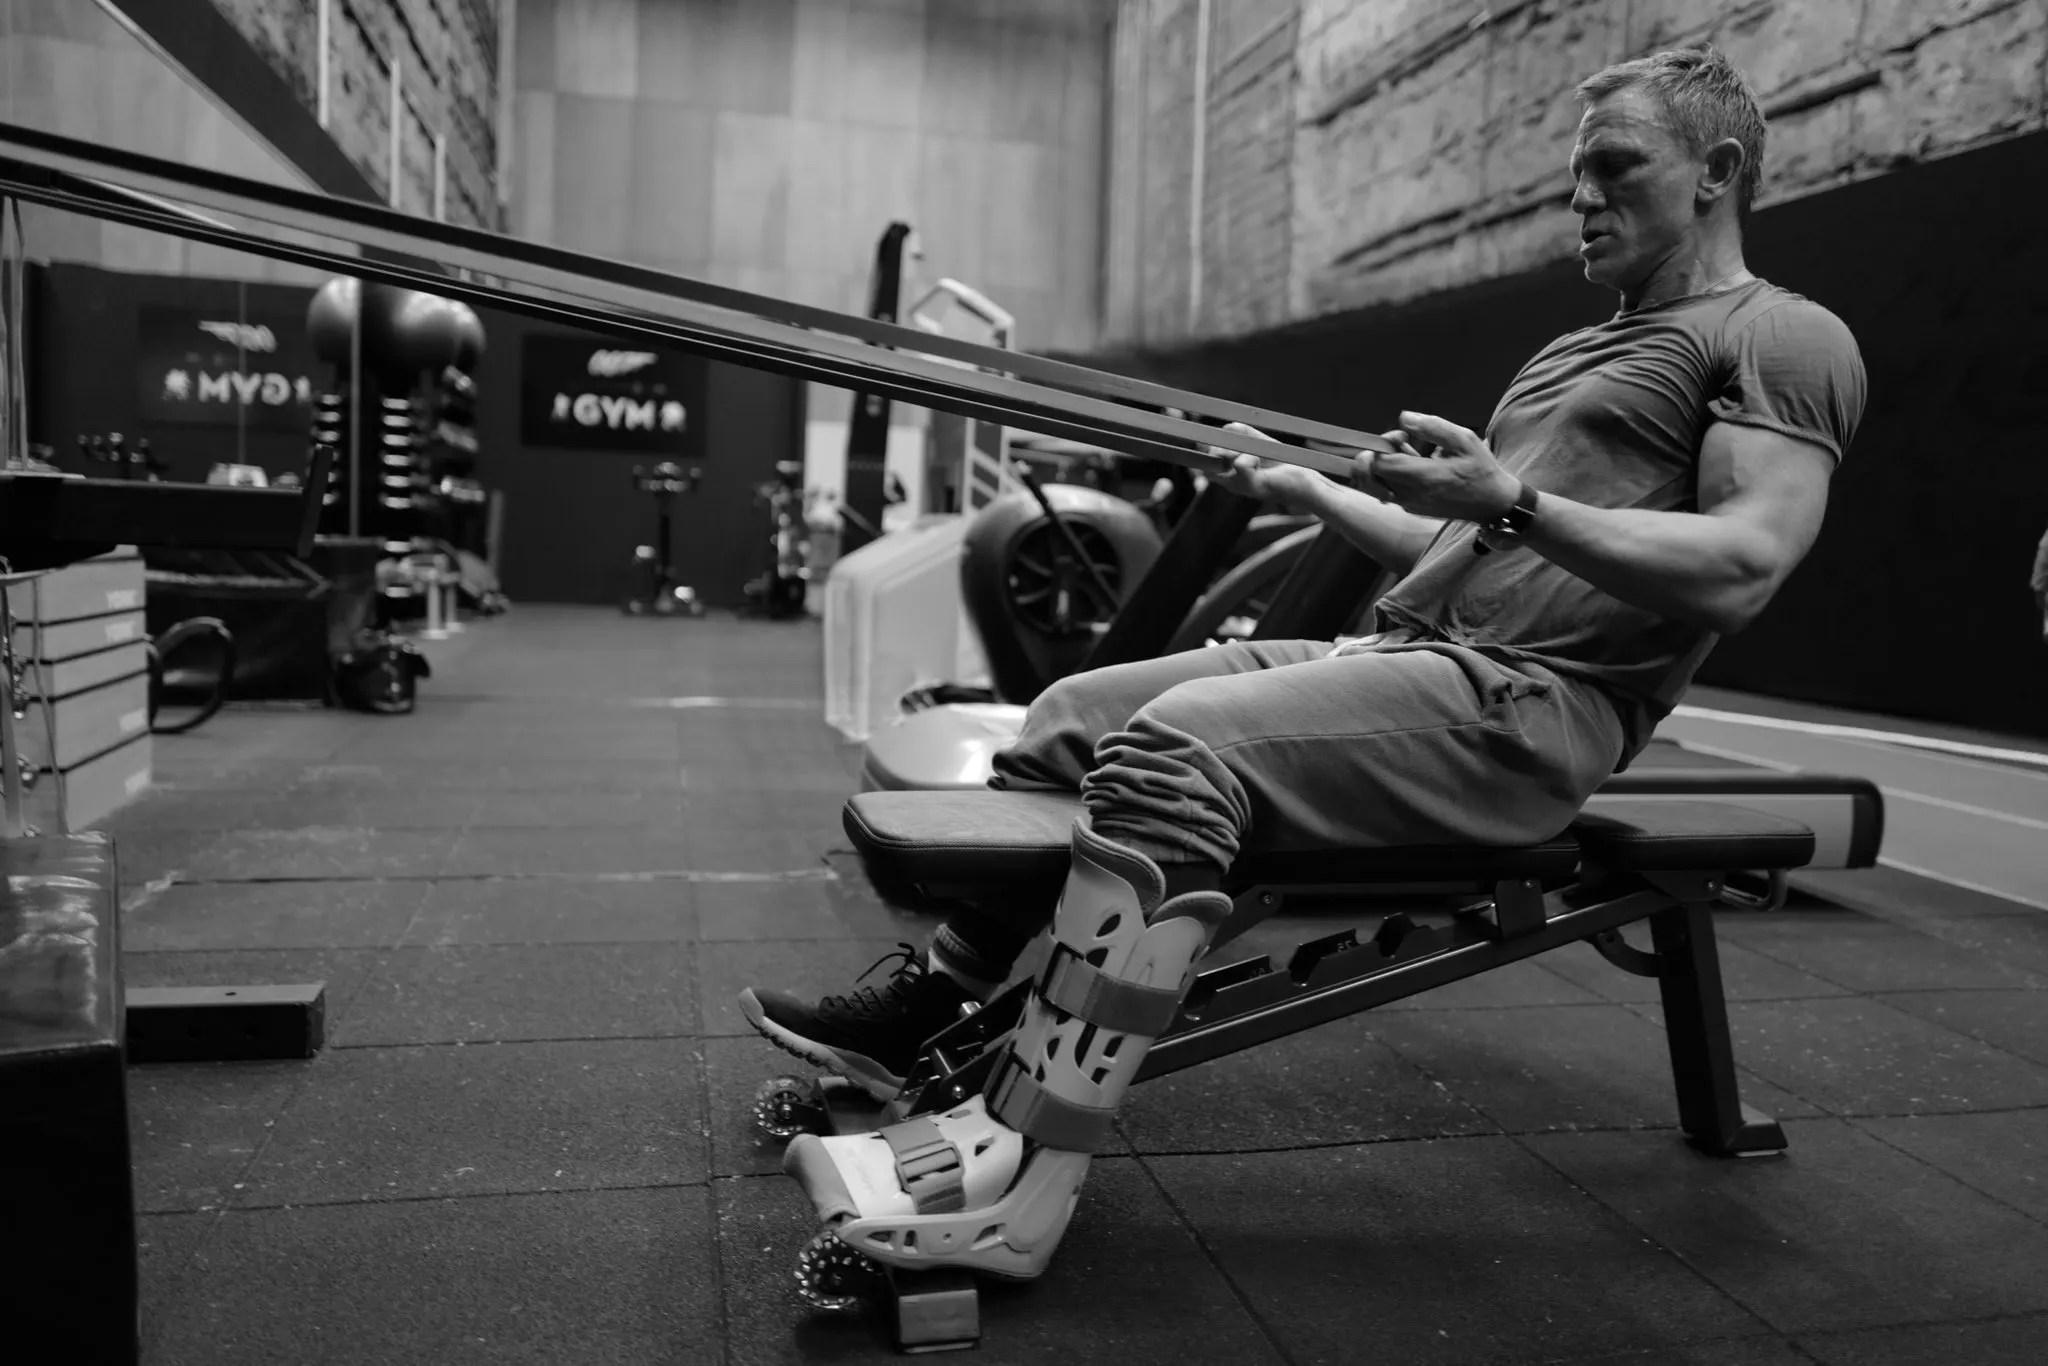 Bond 25: Daniel Craig Injury Revealed in New Behind-the-Scenes Image | Collider